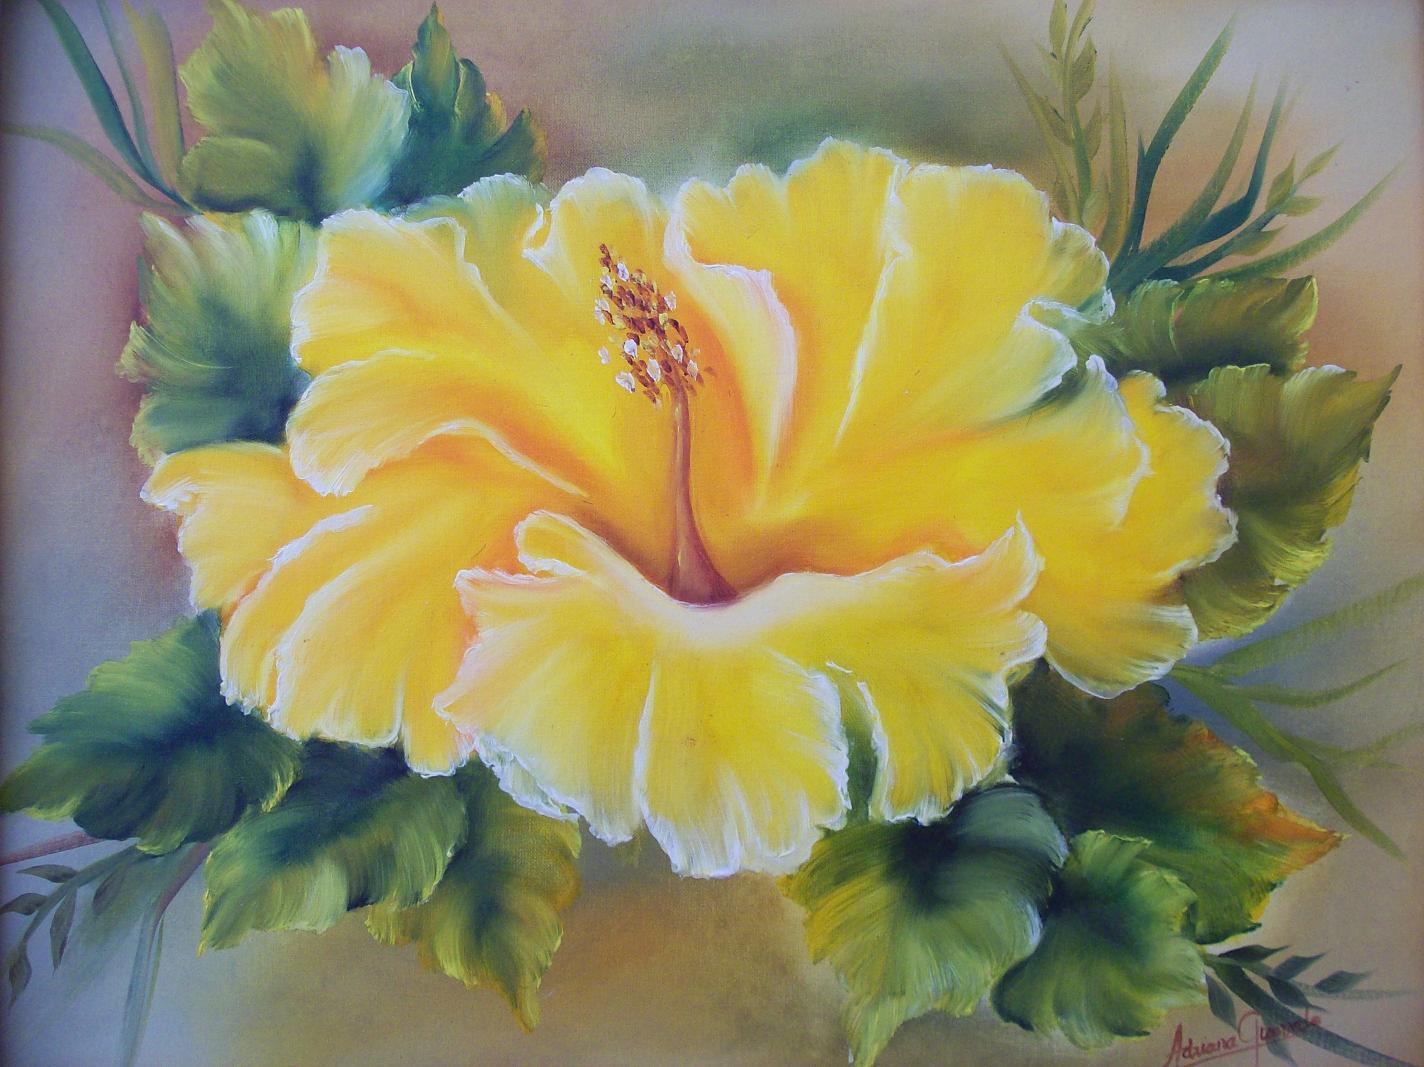 Pintura al oleo como pintar flores diy flowers painting - Floreros modernos ...